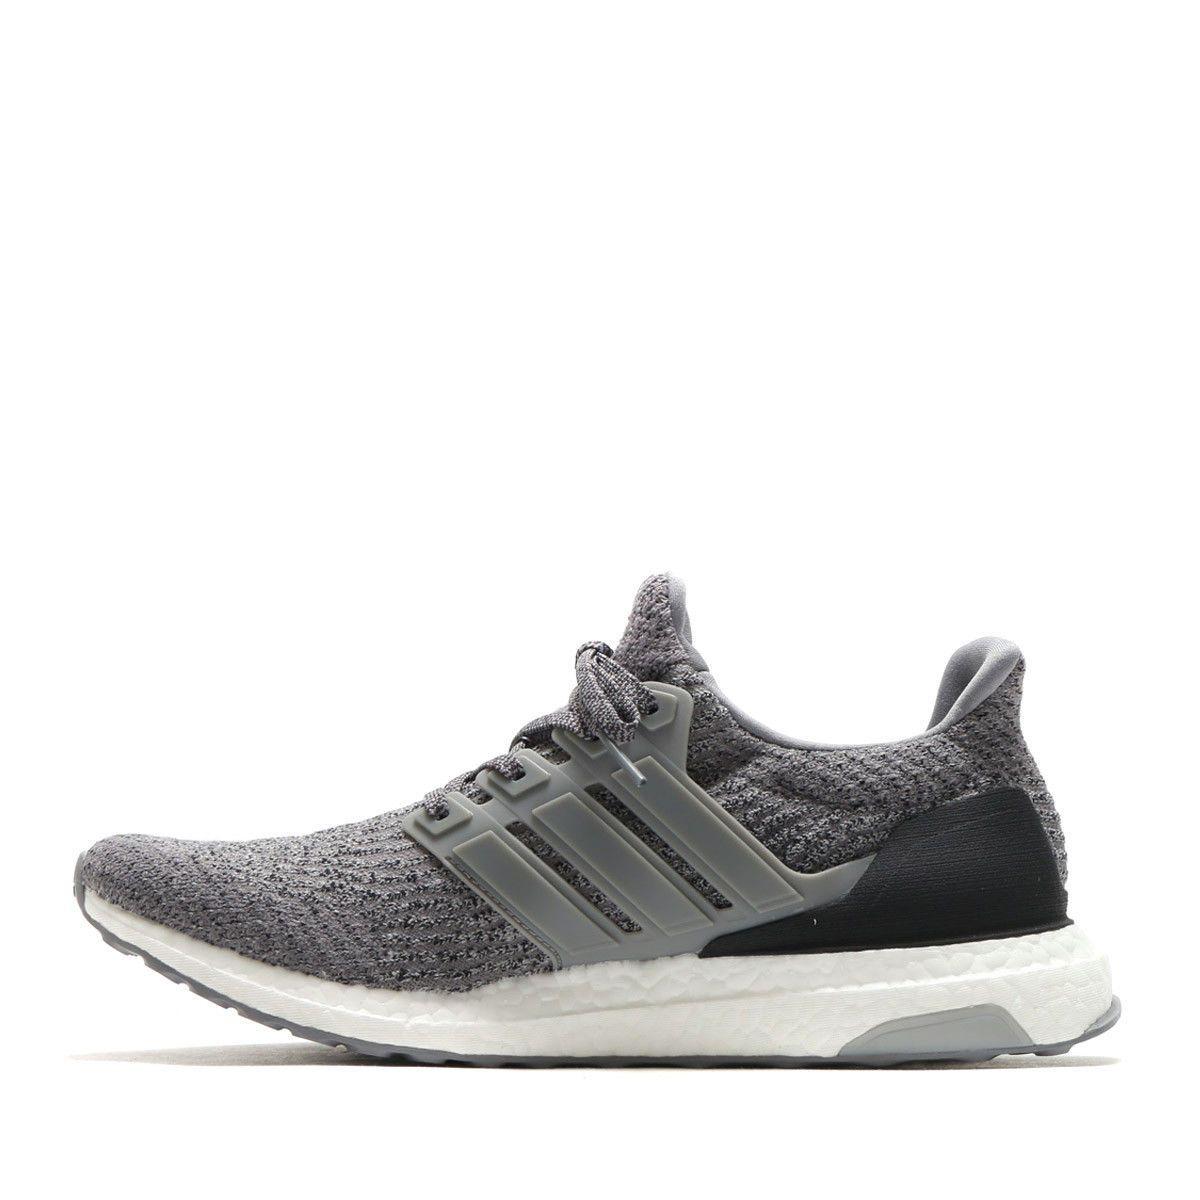 5475fd90089c8 NEW Adidas Ultra Boost 3.0 Grey Three Gray Black White S82023 Men s ...